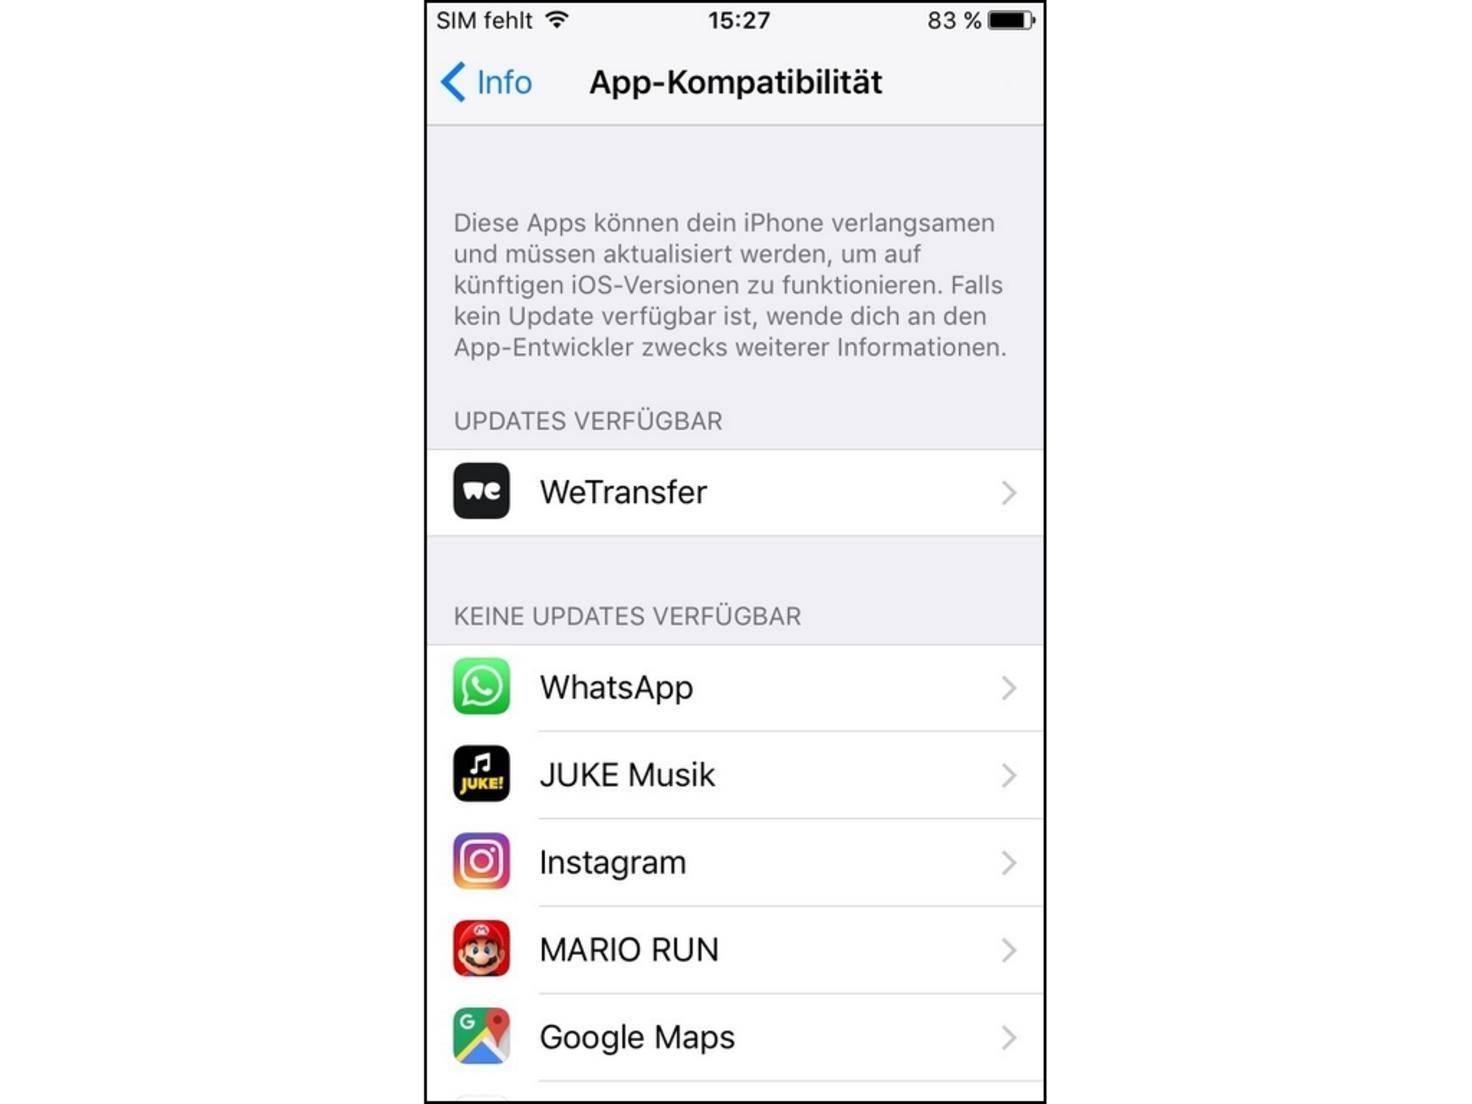 App Kompatibilität